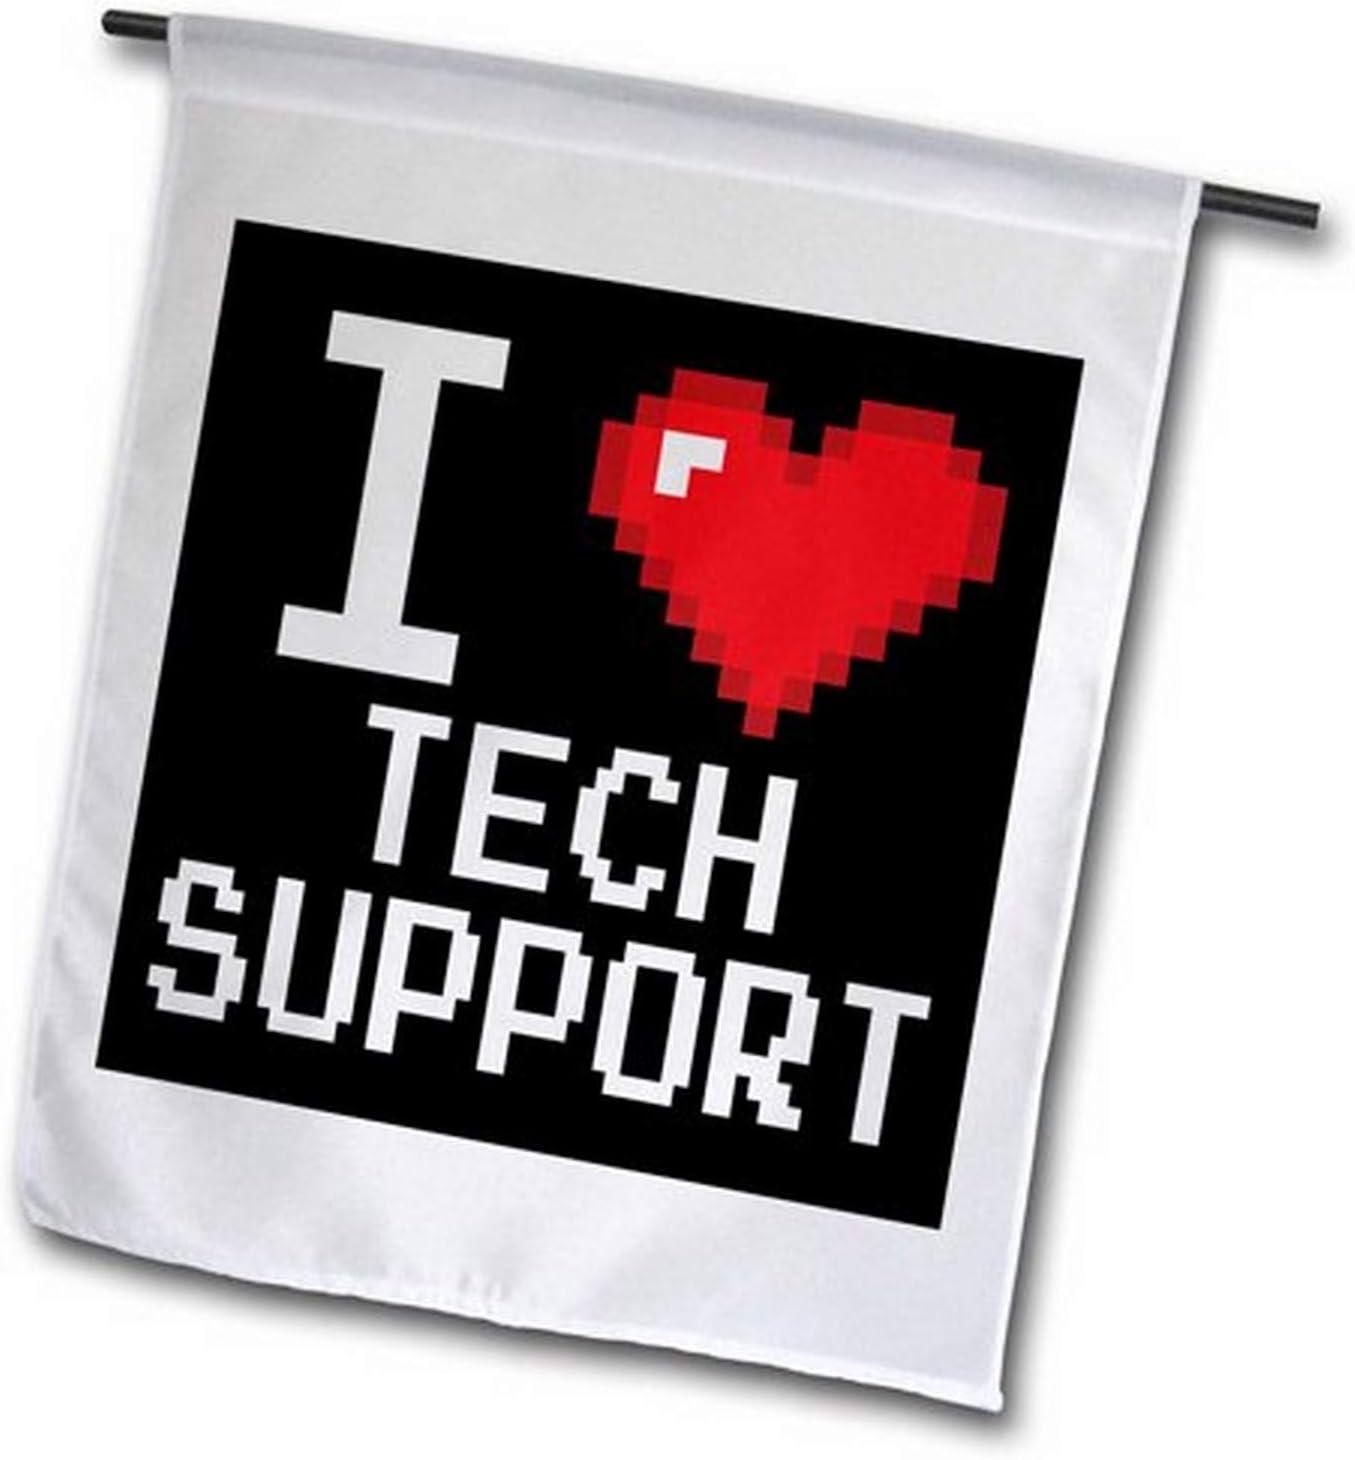 3dRose fl_118943_1 Geeky Old School Pixelated Pixels 8-Bit I Heart I Love Tech Support Garden Flag, 12 by 18